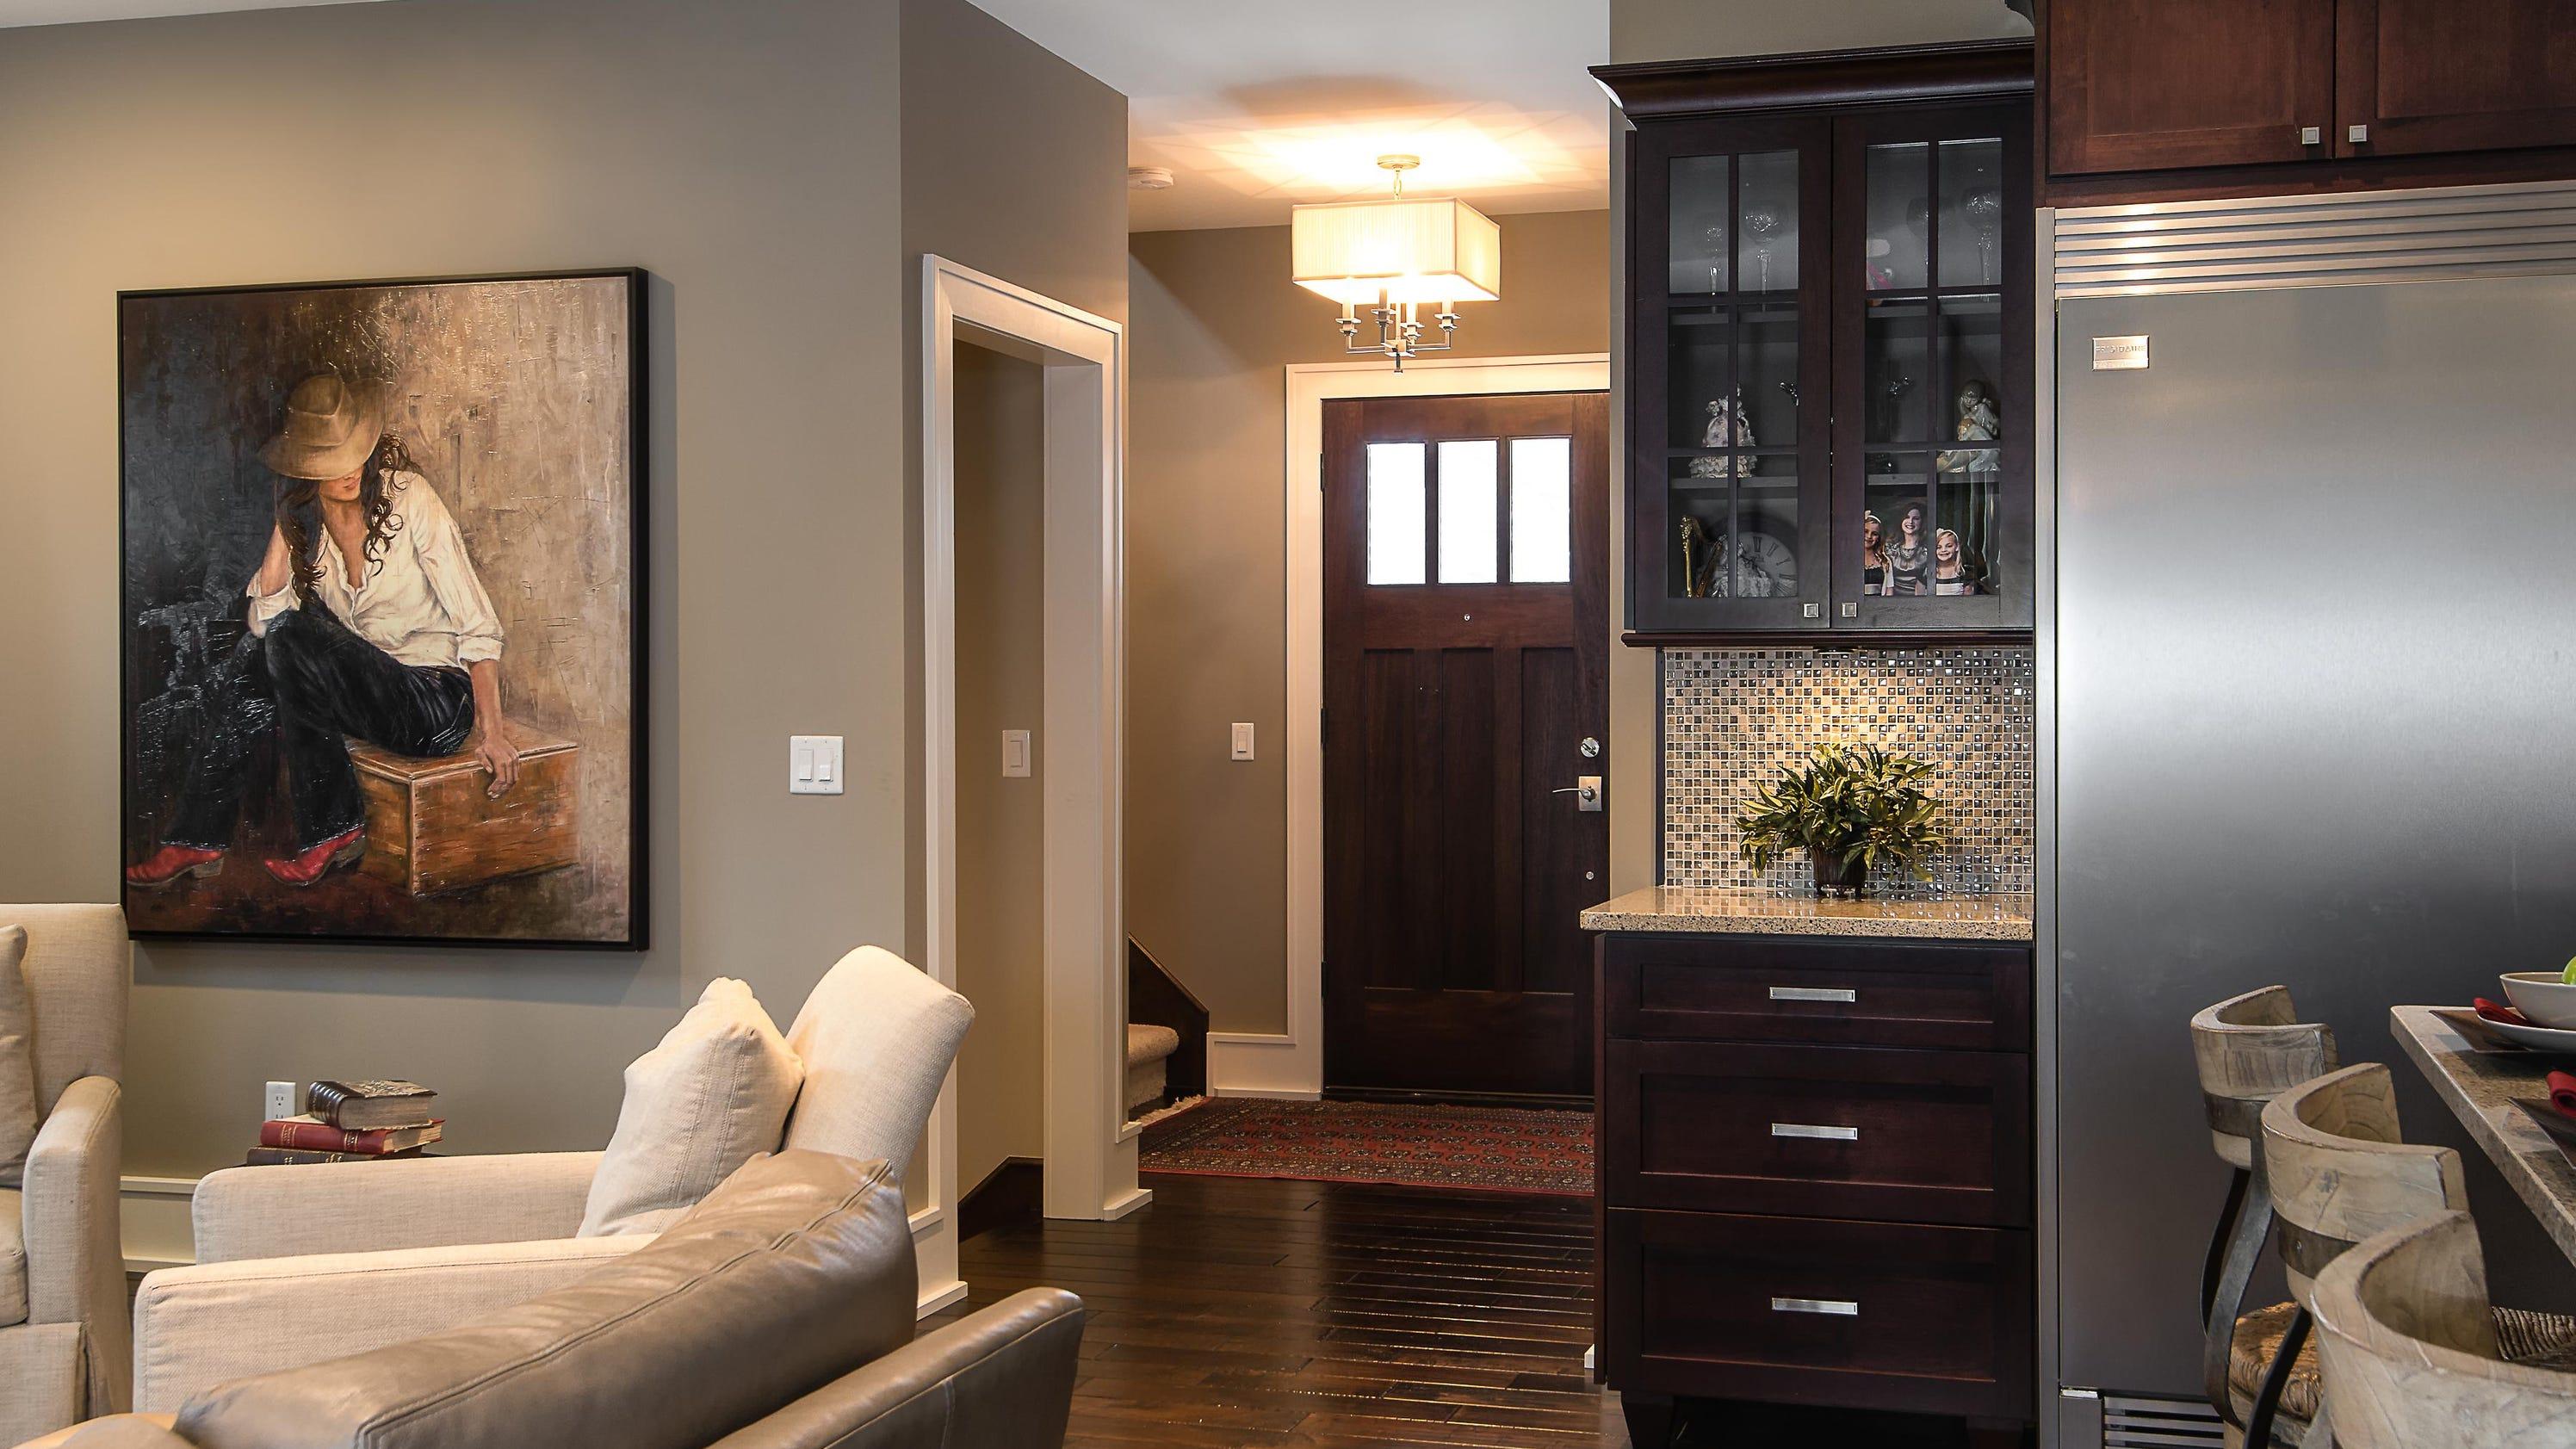 Pros weigh in on finding the missing link in room design for Home landscape design suite 8 0 link